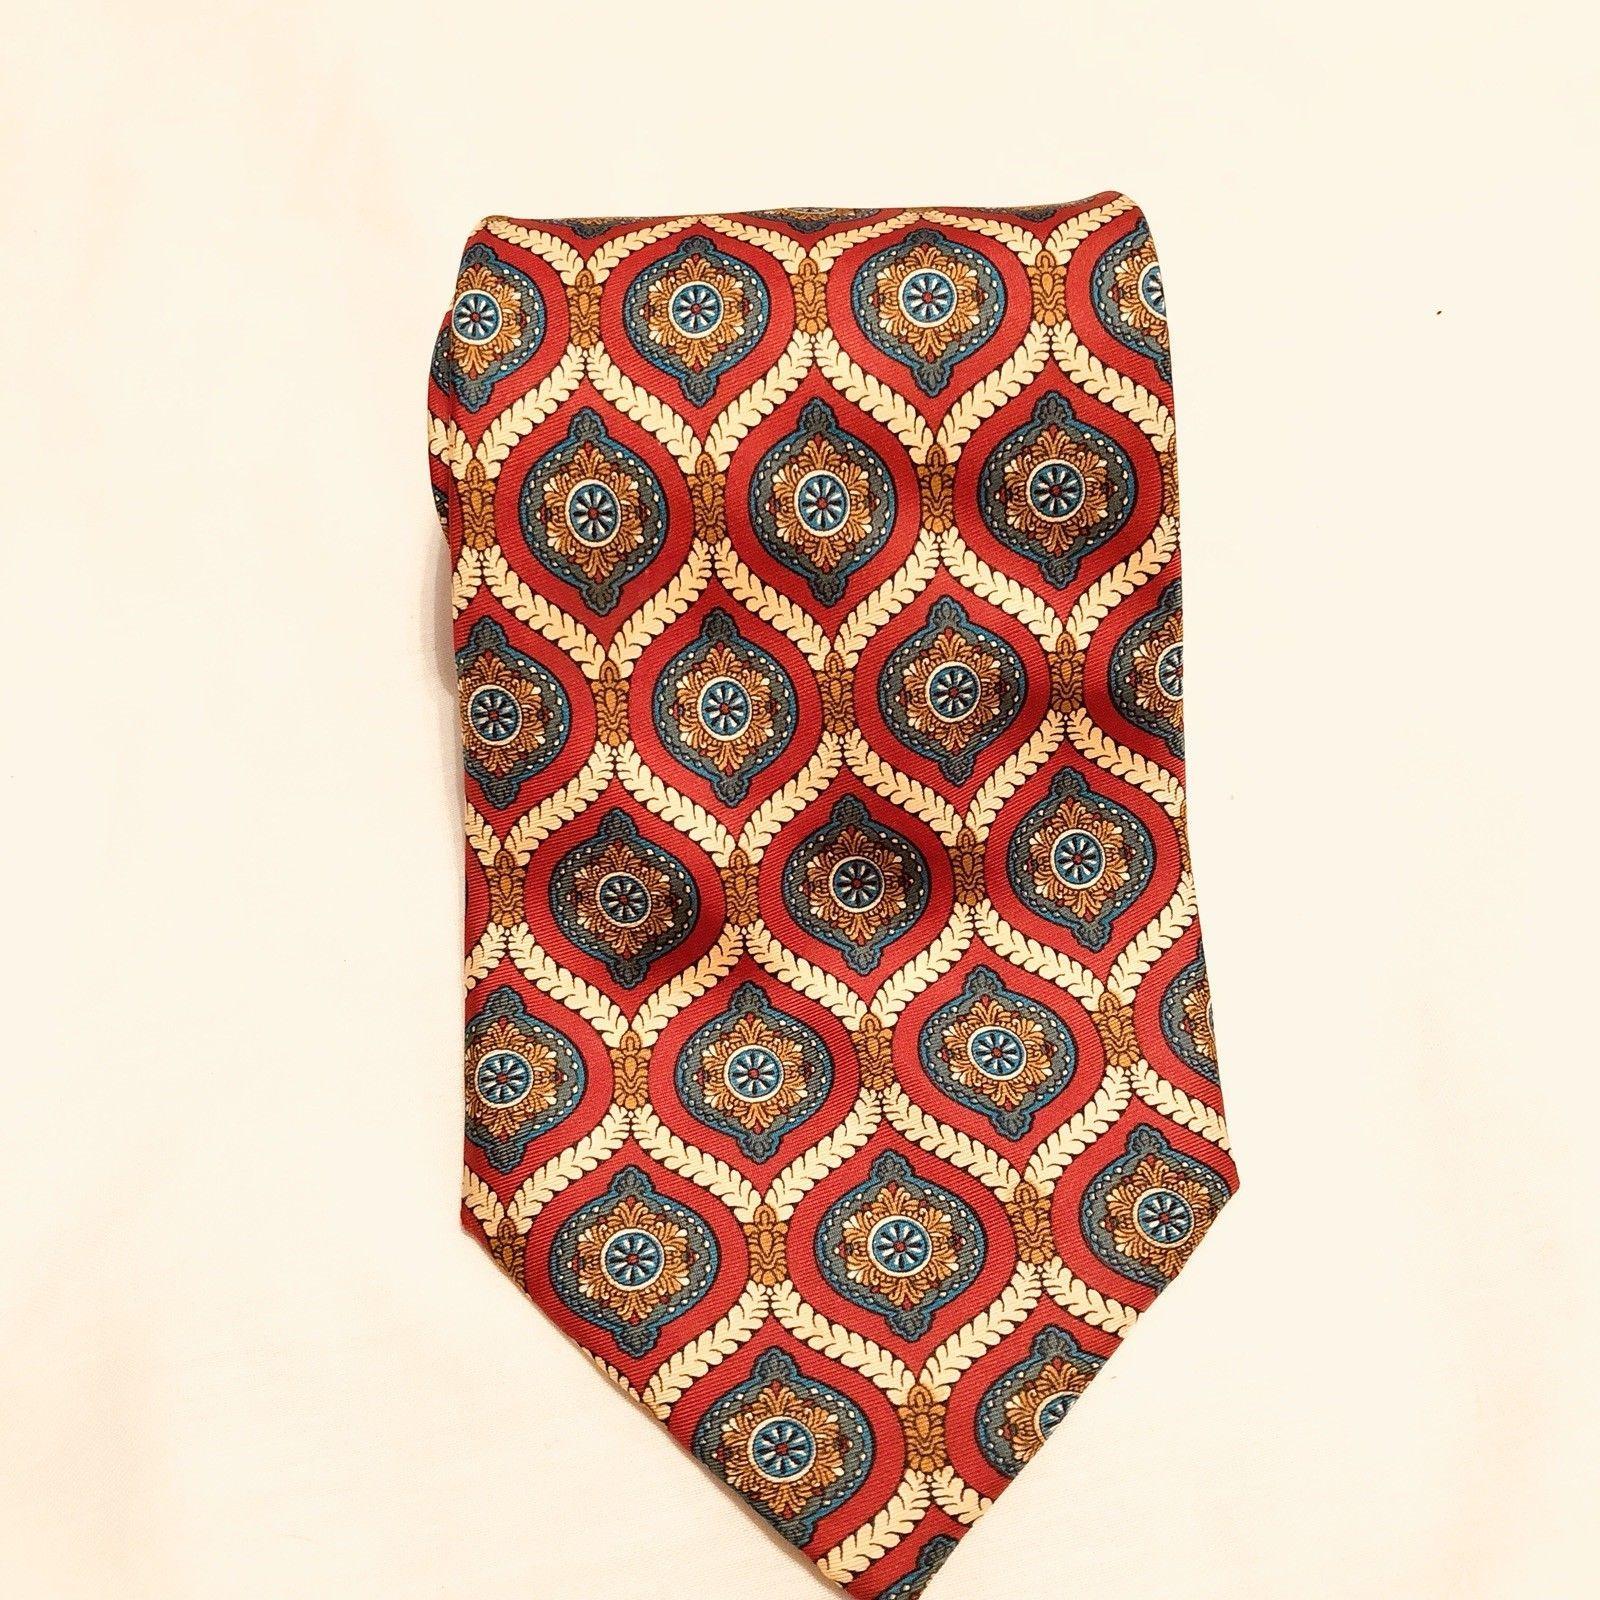 FENDI Men's 100% Silk Handmade in Italy Necktie Red